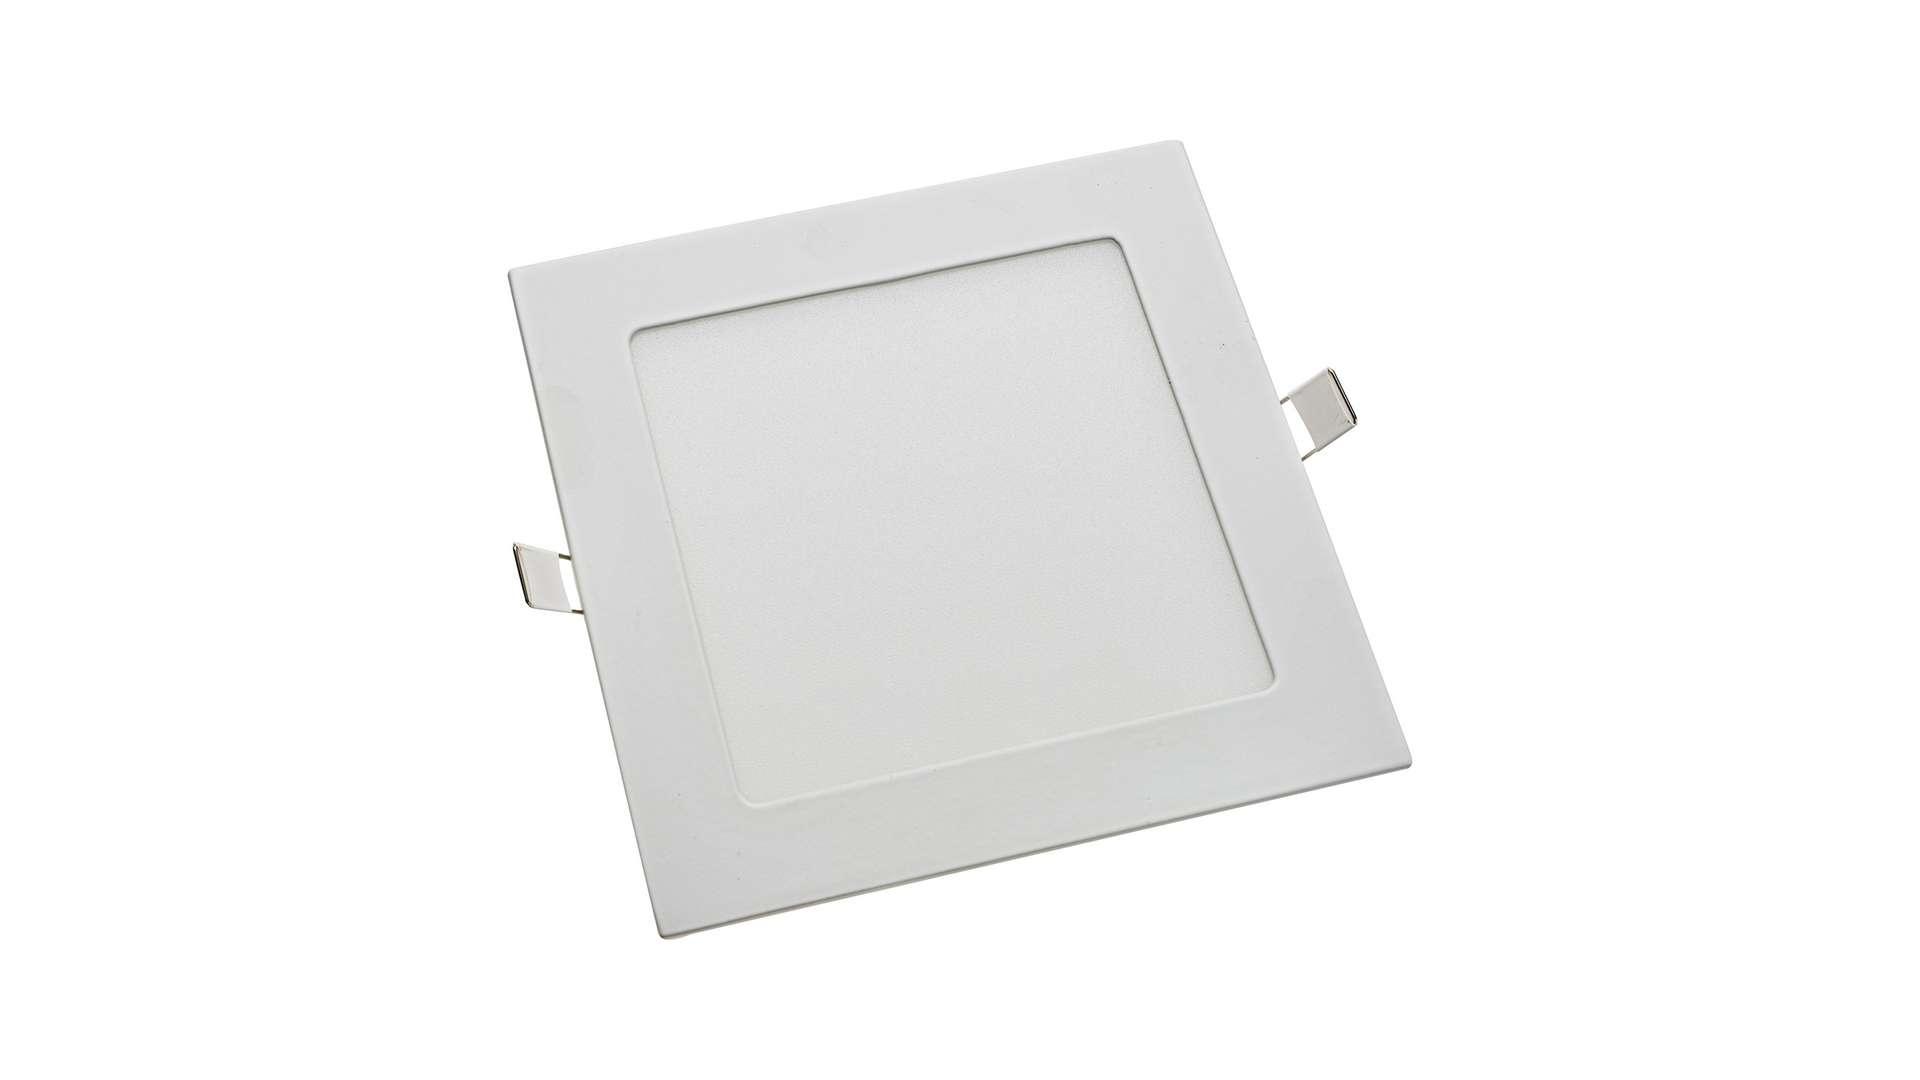 LED Panel 18W square neutral white